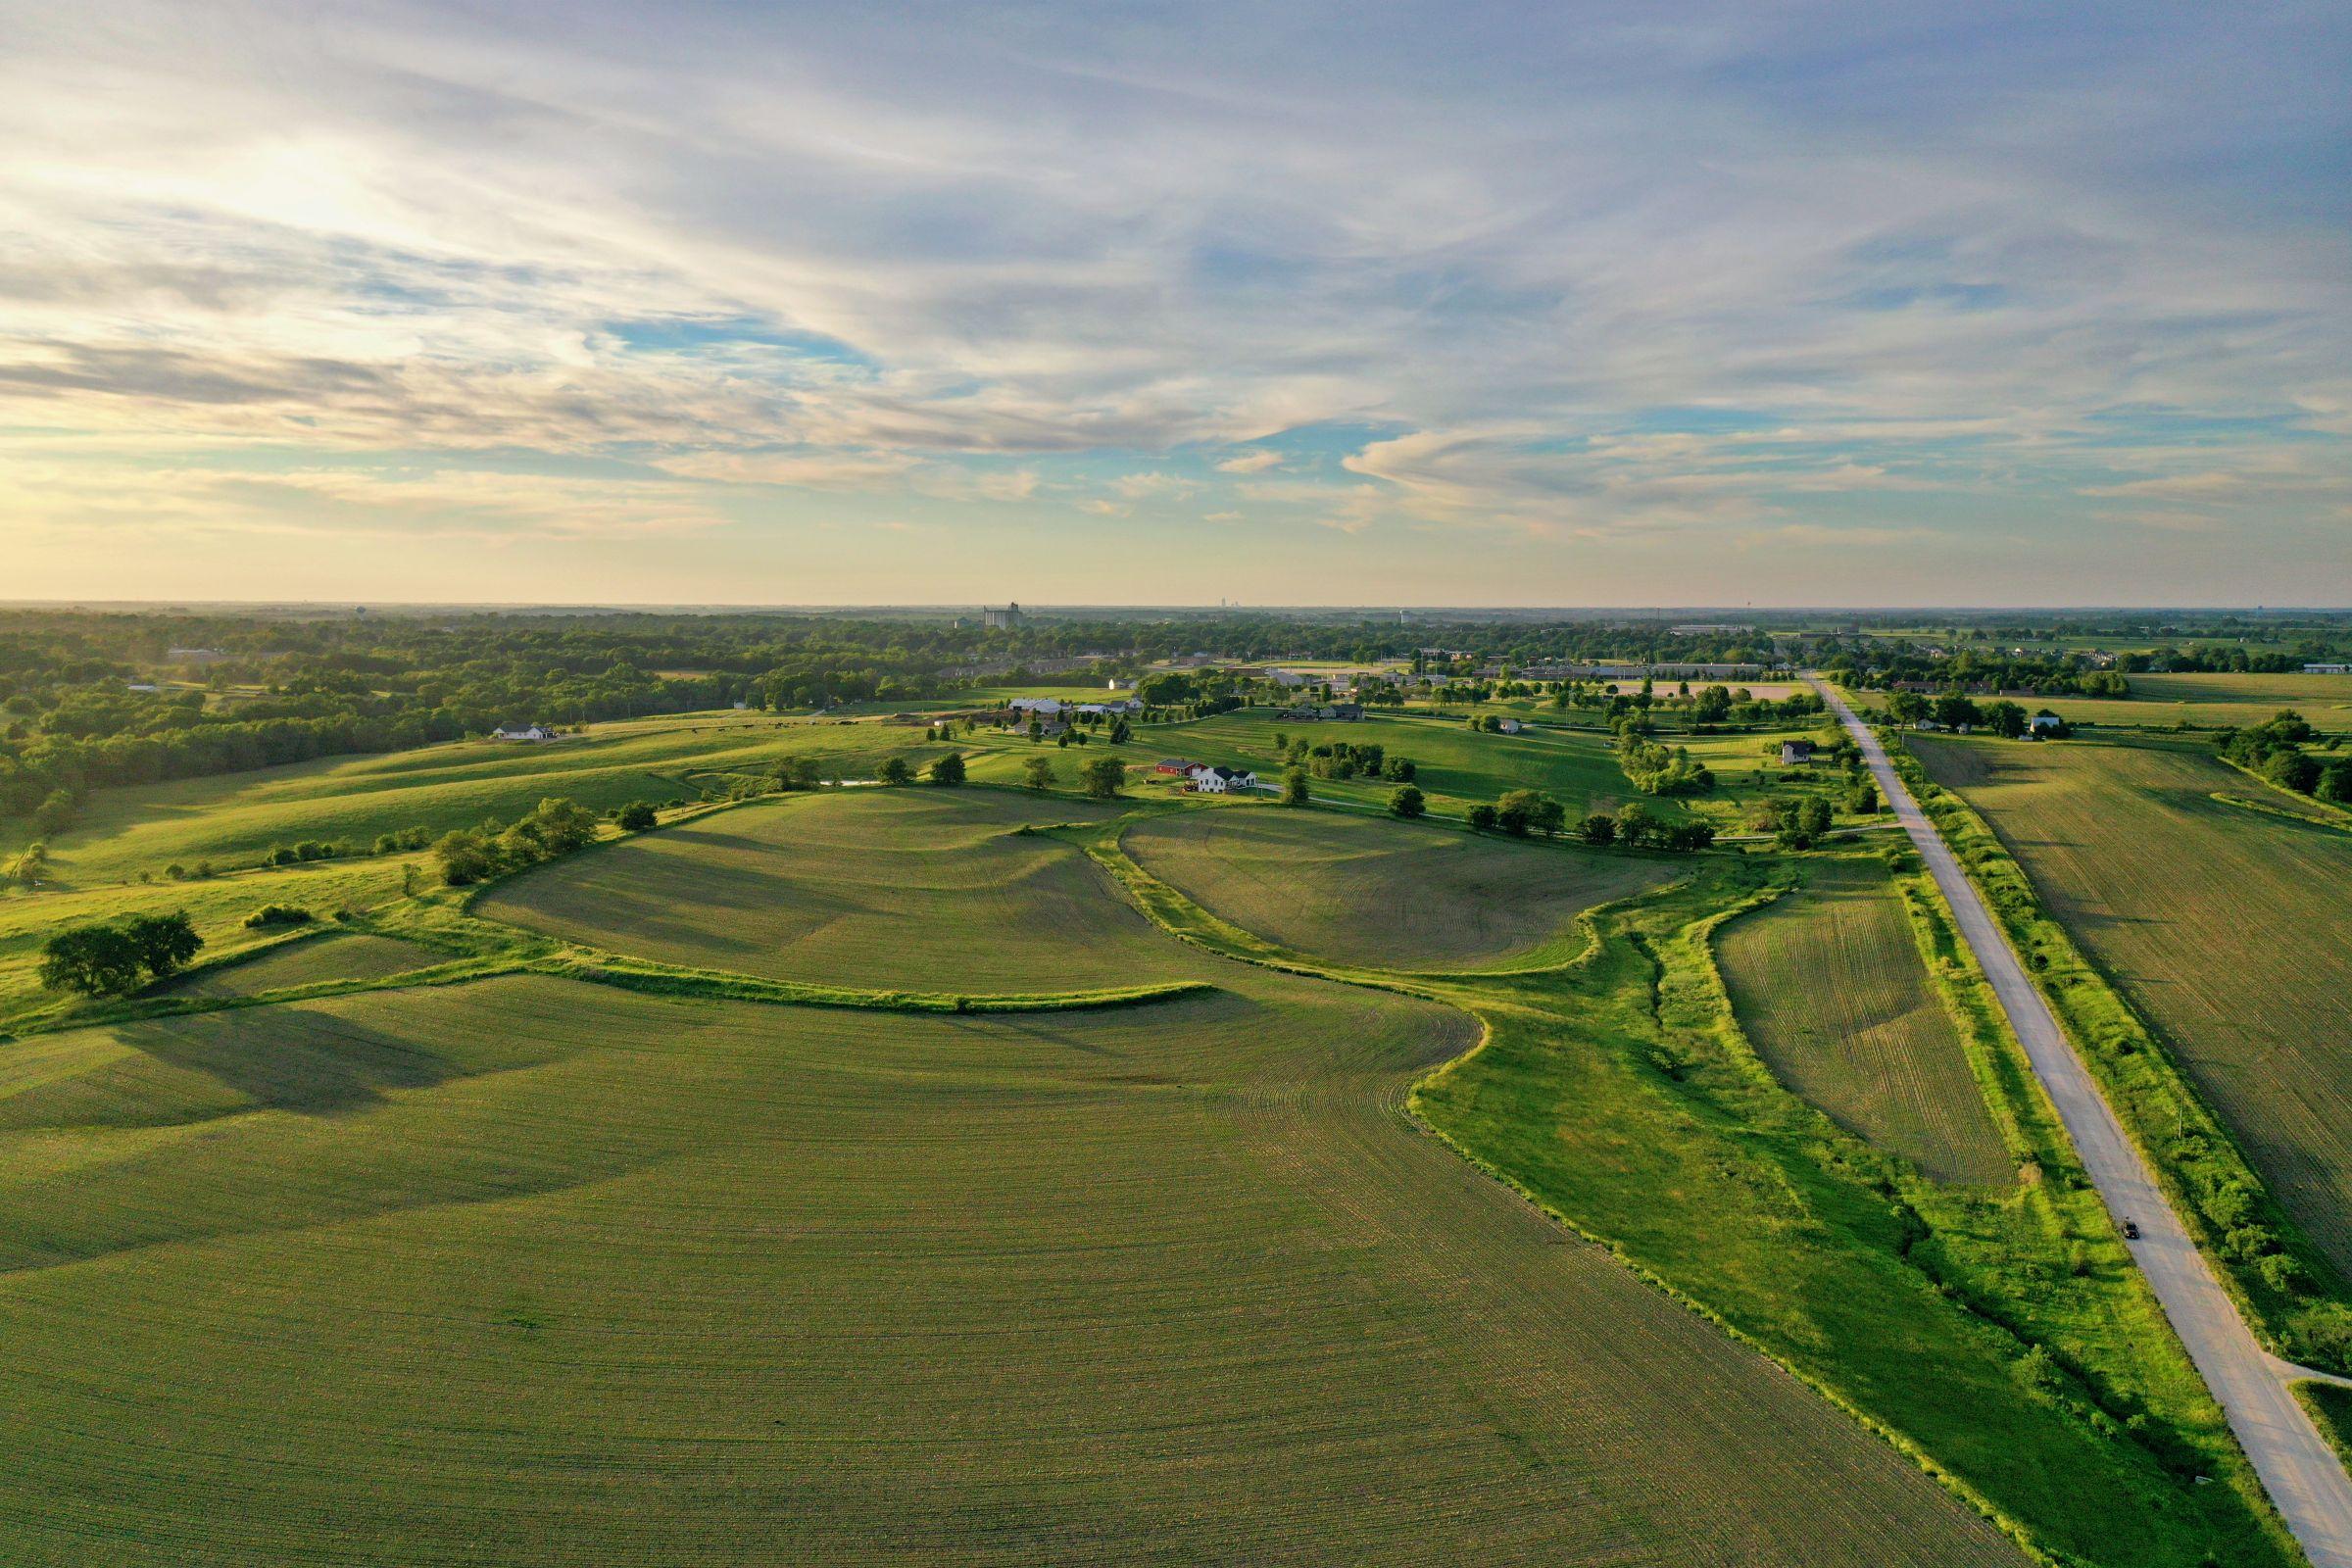 development-land-warren-county-iowa-20-acres-listing-number-15423-4-2021-03-25-202930.JPG